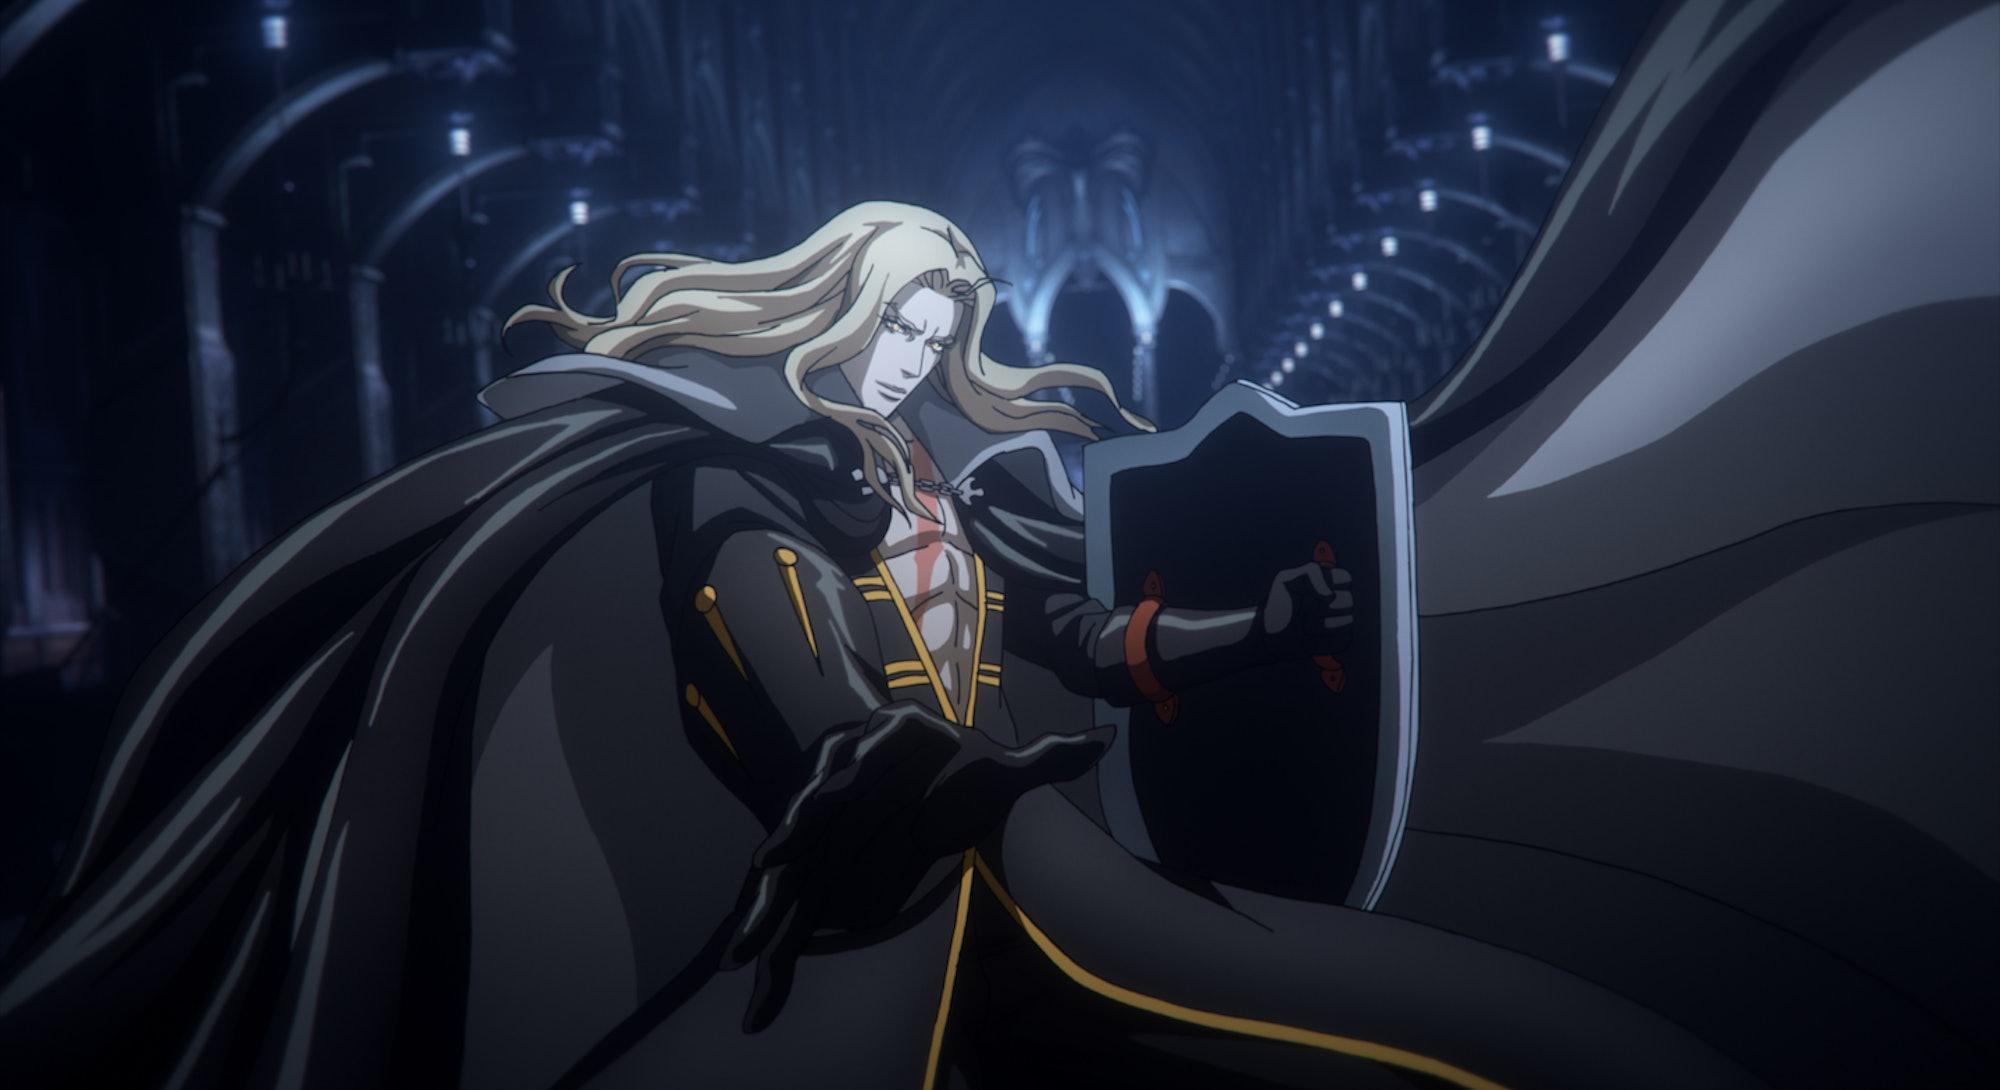 castlevania season 4 netflix